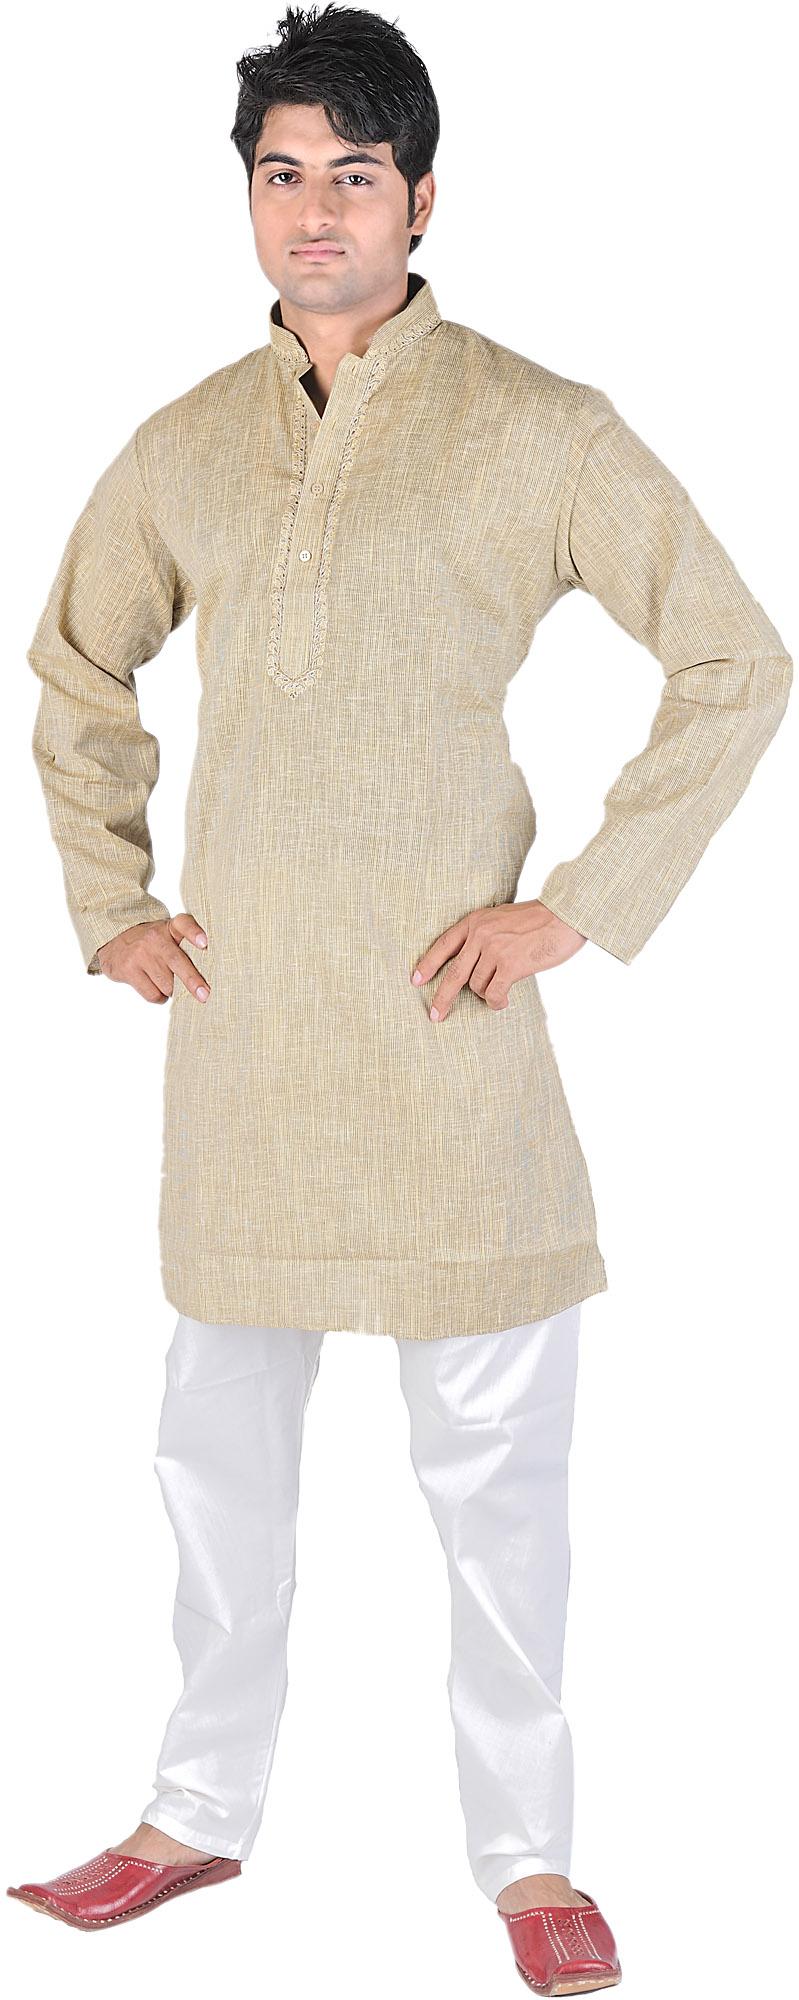 Beige Kurta Pajama With Embroidery On Neck And Fine Stripes